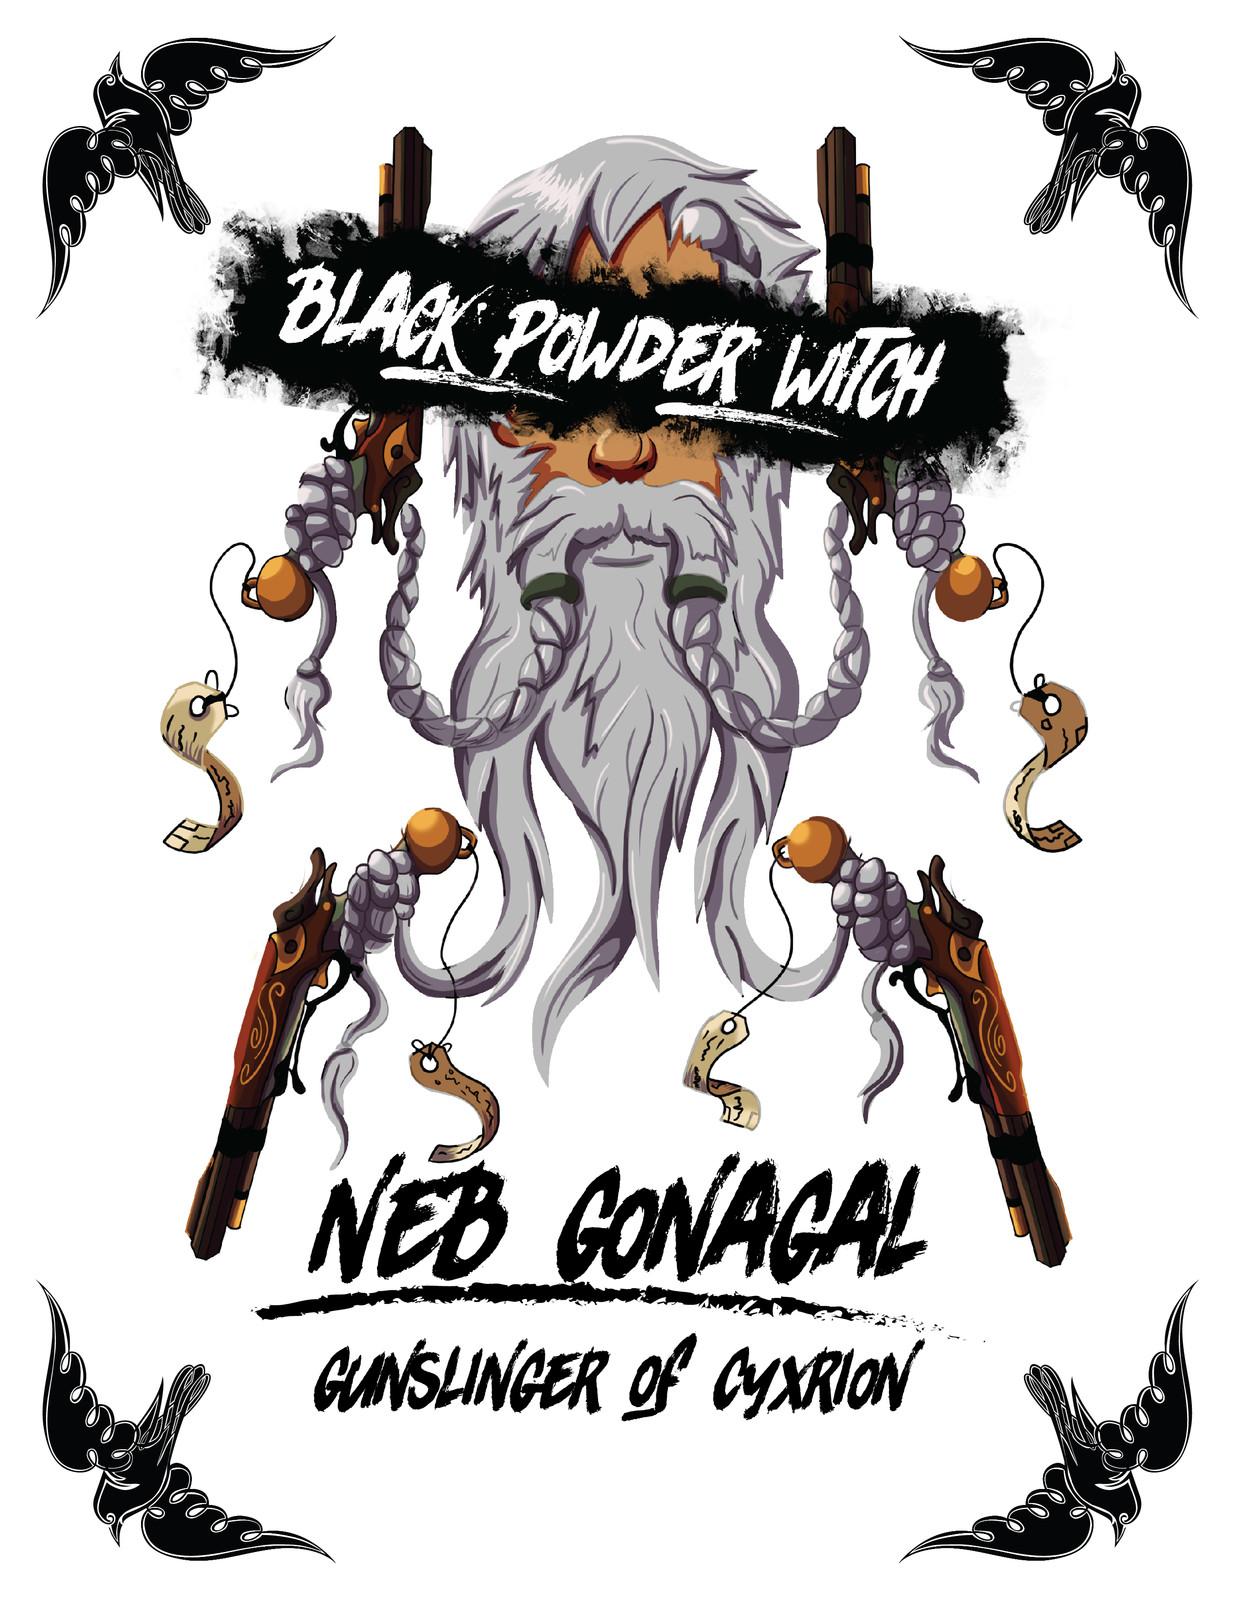 Neb Gonagal the Black Powder Witch